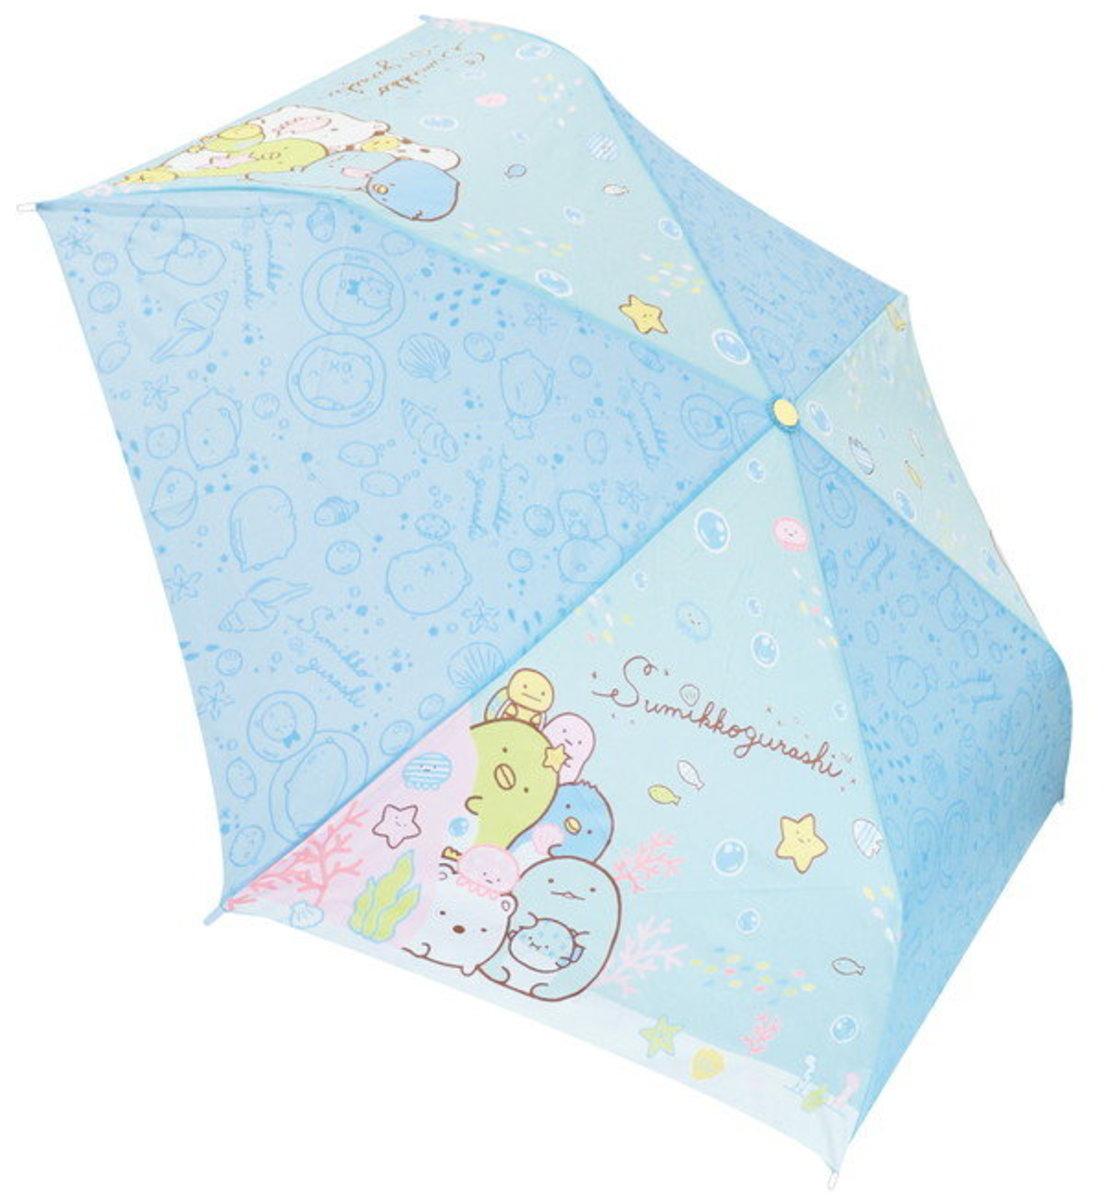 日本 J's Planning Sumikko Gurashi 角落生物 耐風骨摺疊雨傘 (90318) 53cm 傘半徑